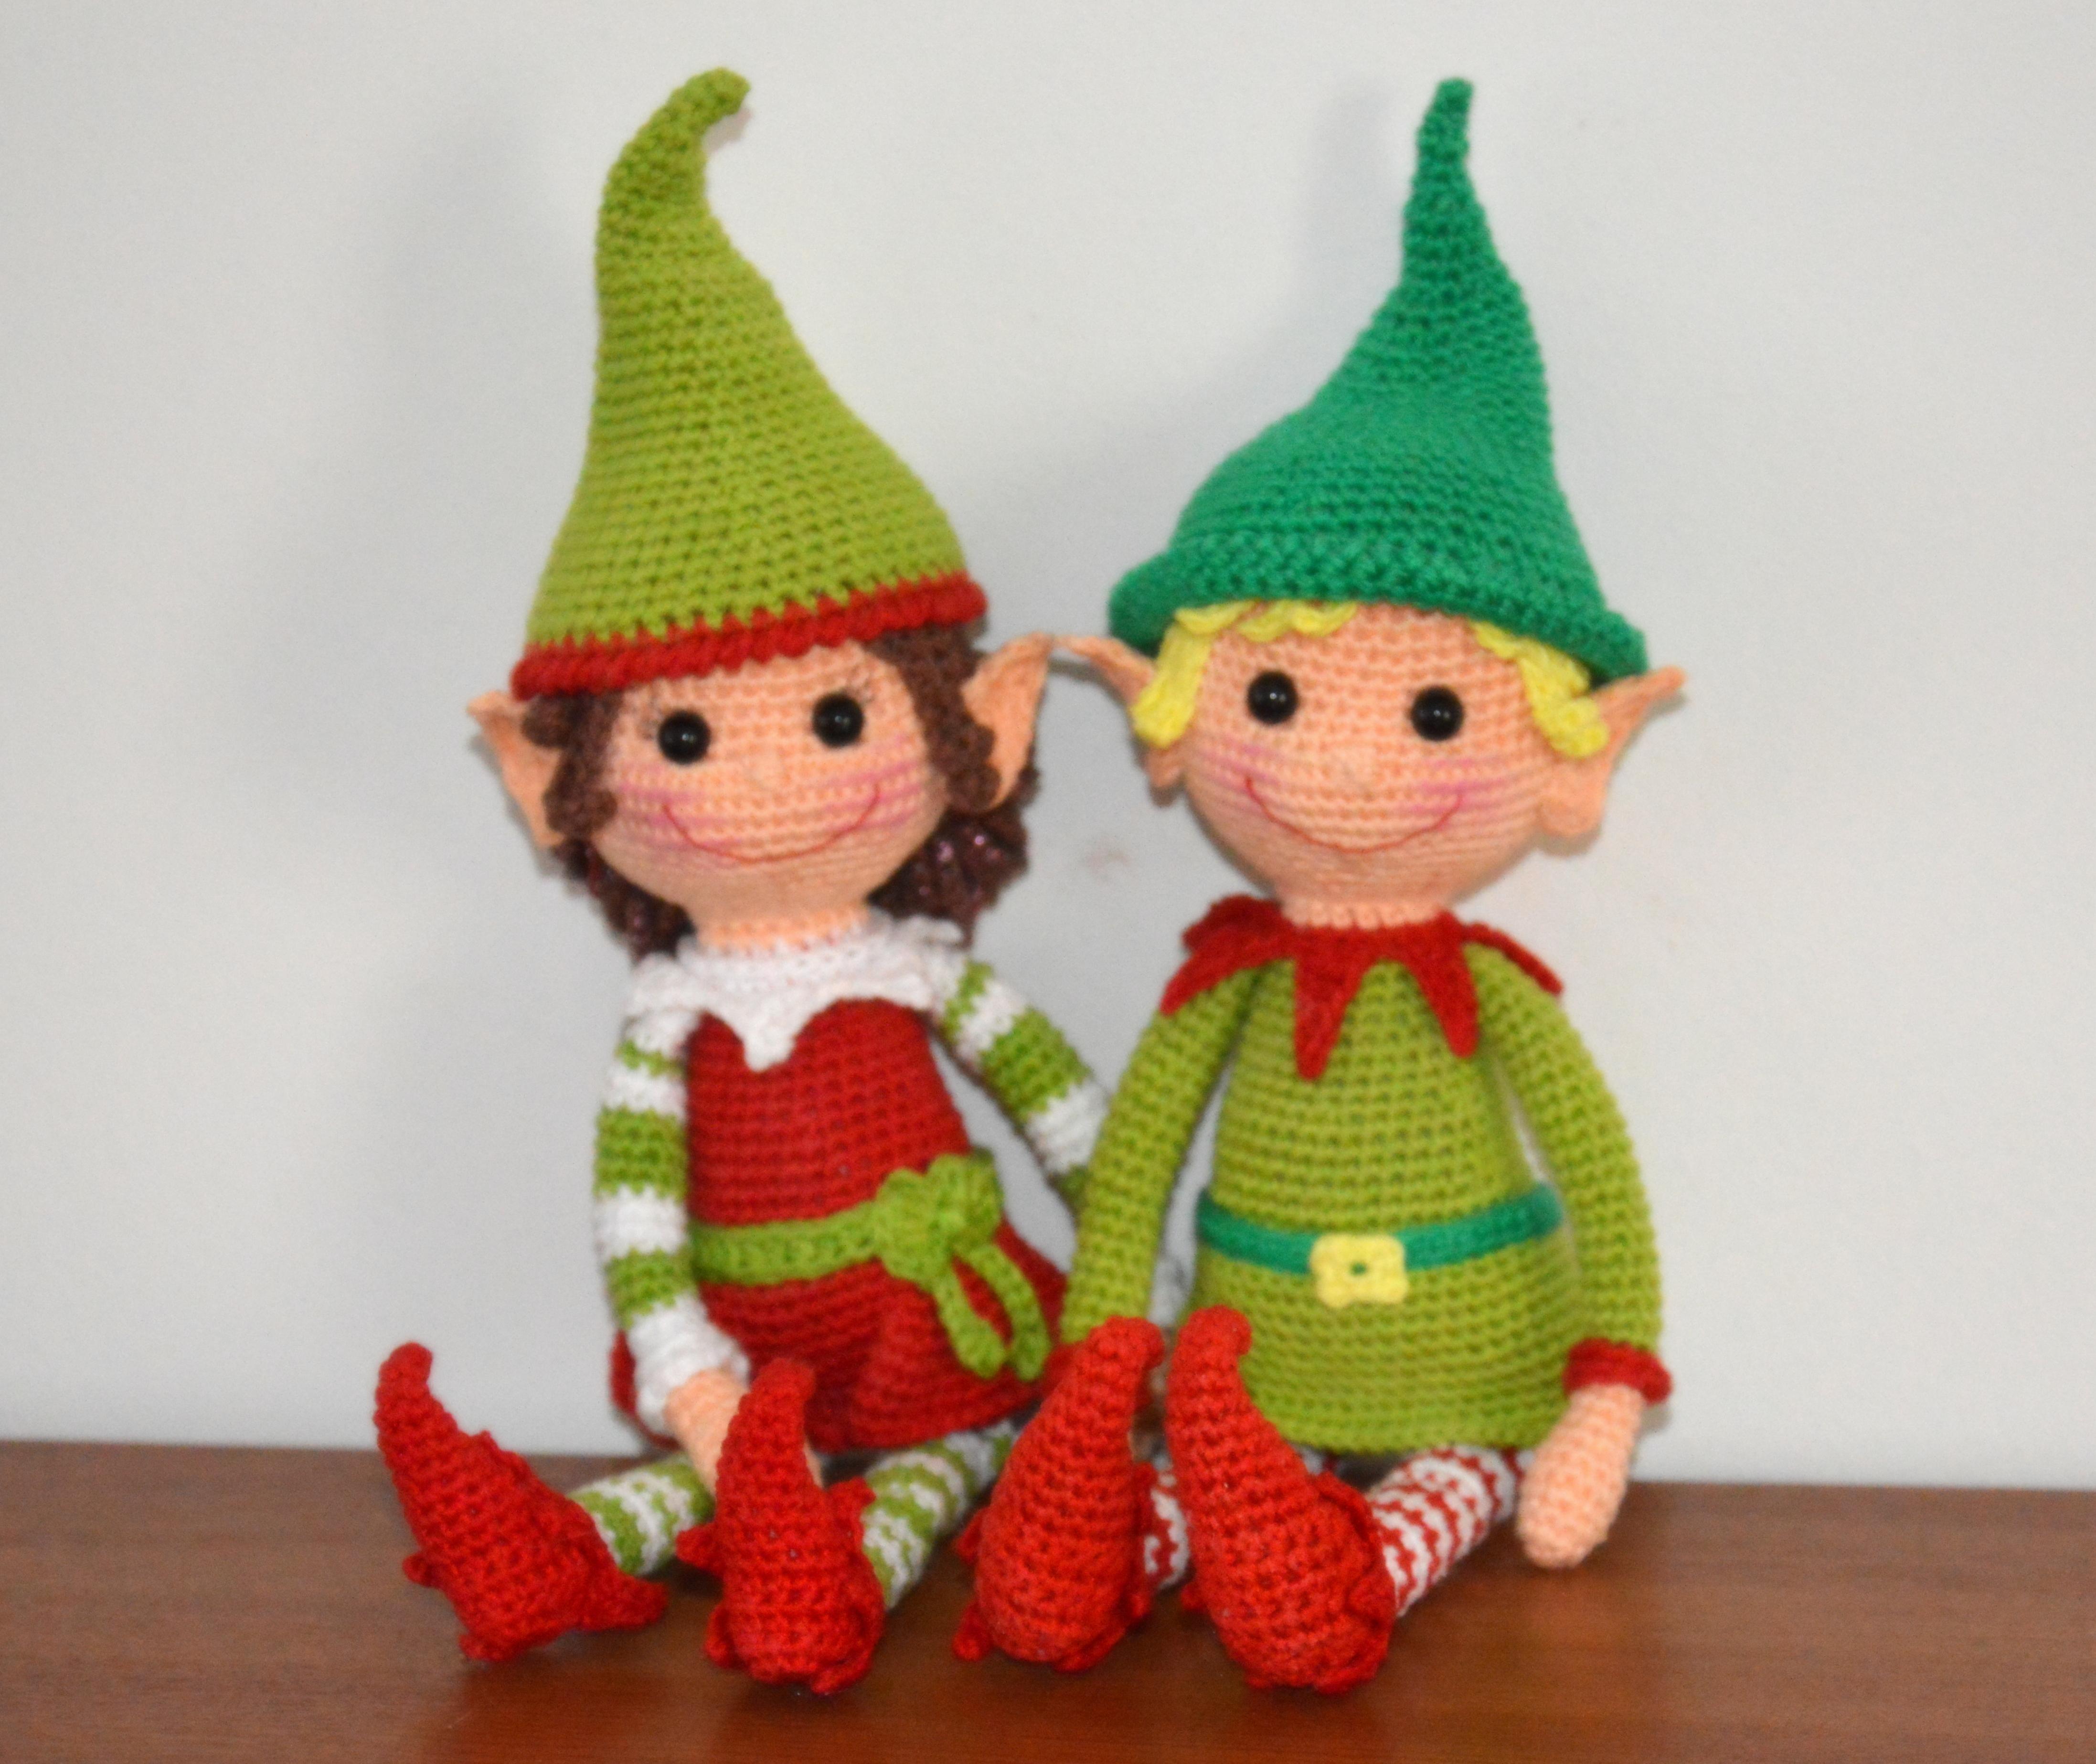 Heart & Sew: Christmas Elf - Free Crochet / Amigurumi Pattern | 3694x4389